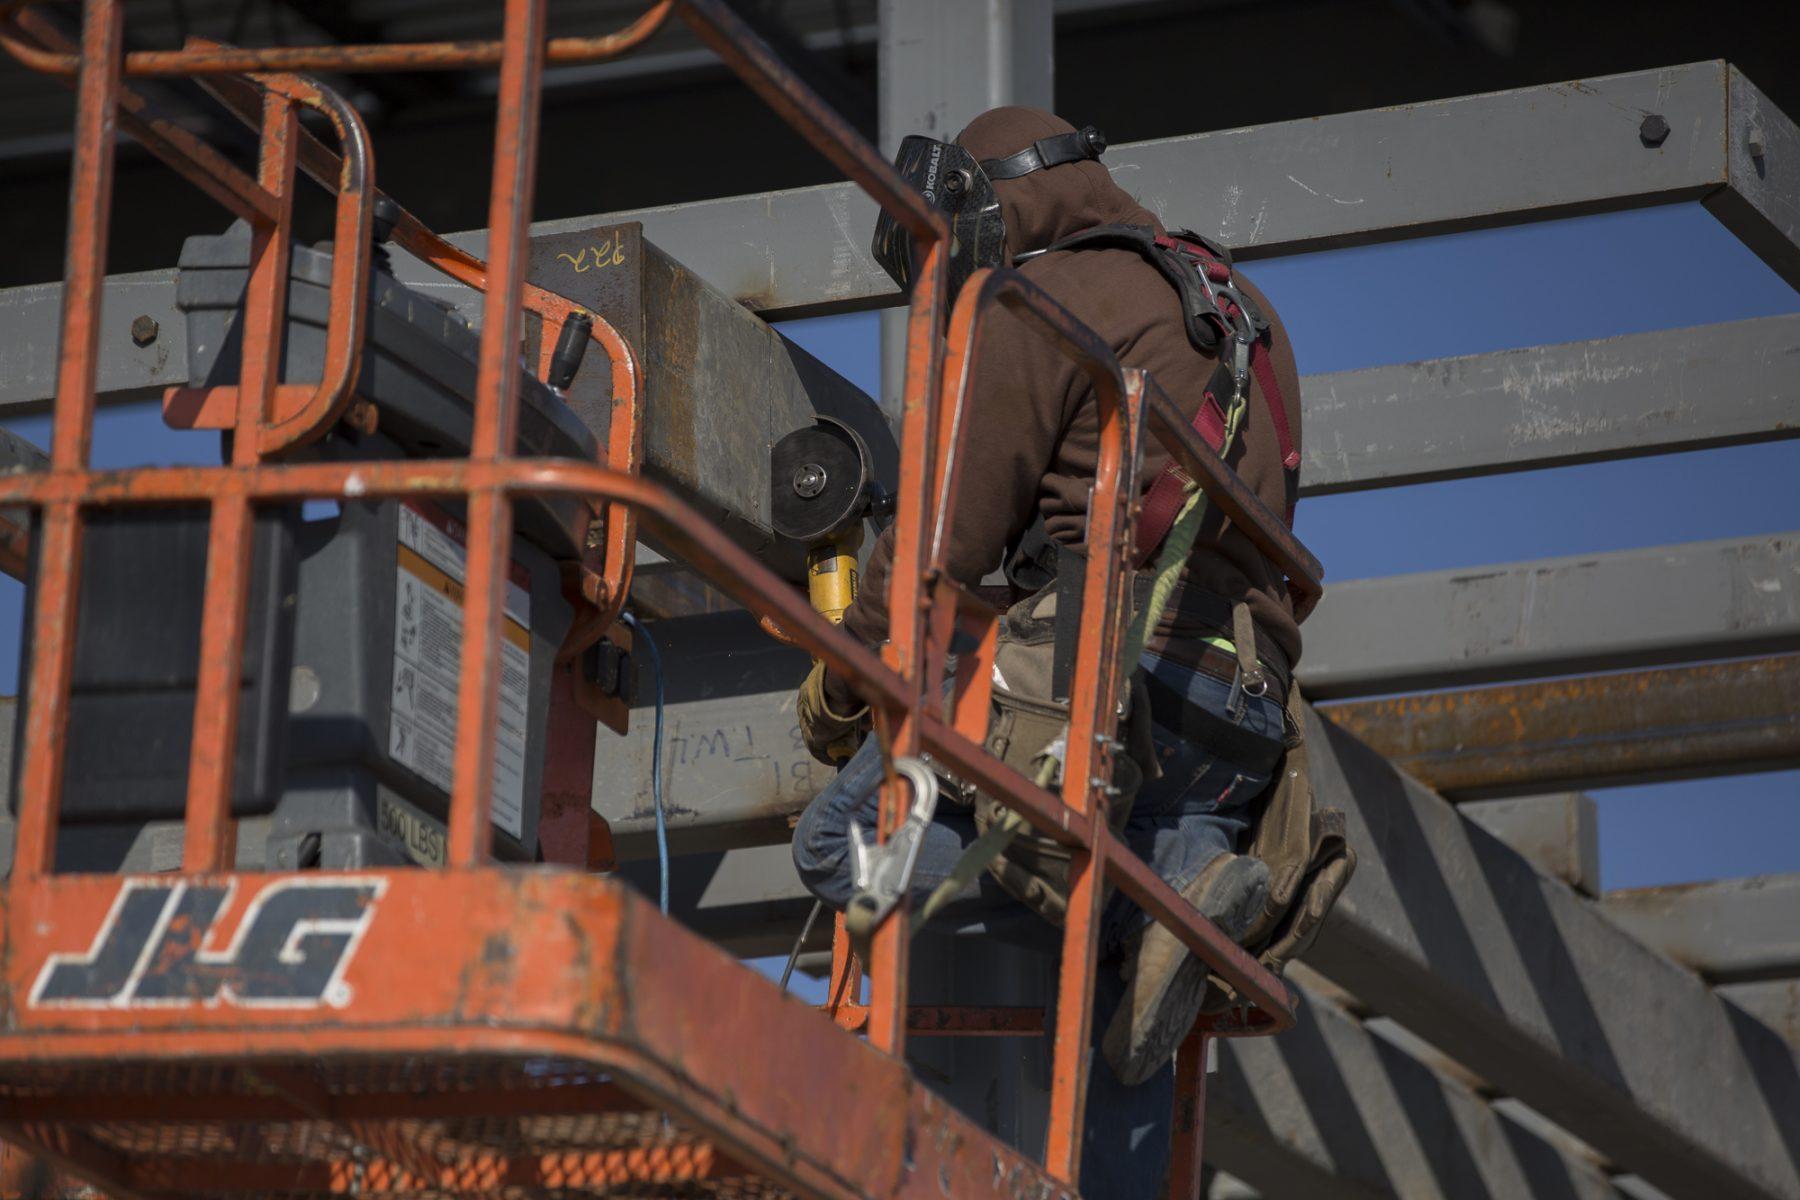 Tom-Wood-Lexus-Capitol-Construction-Web-Ready-74